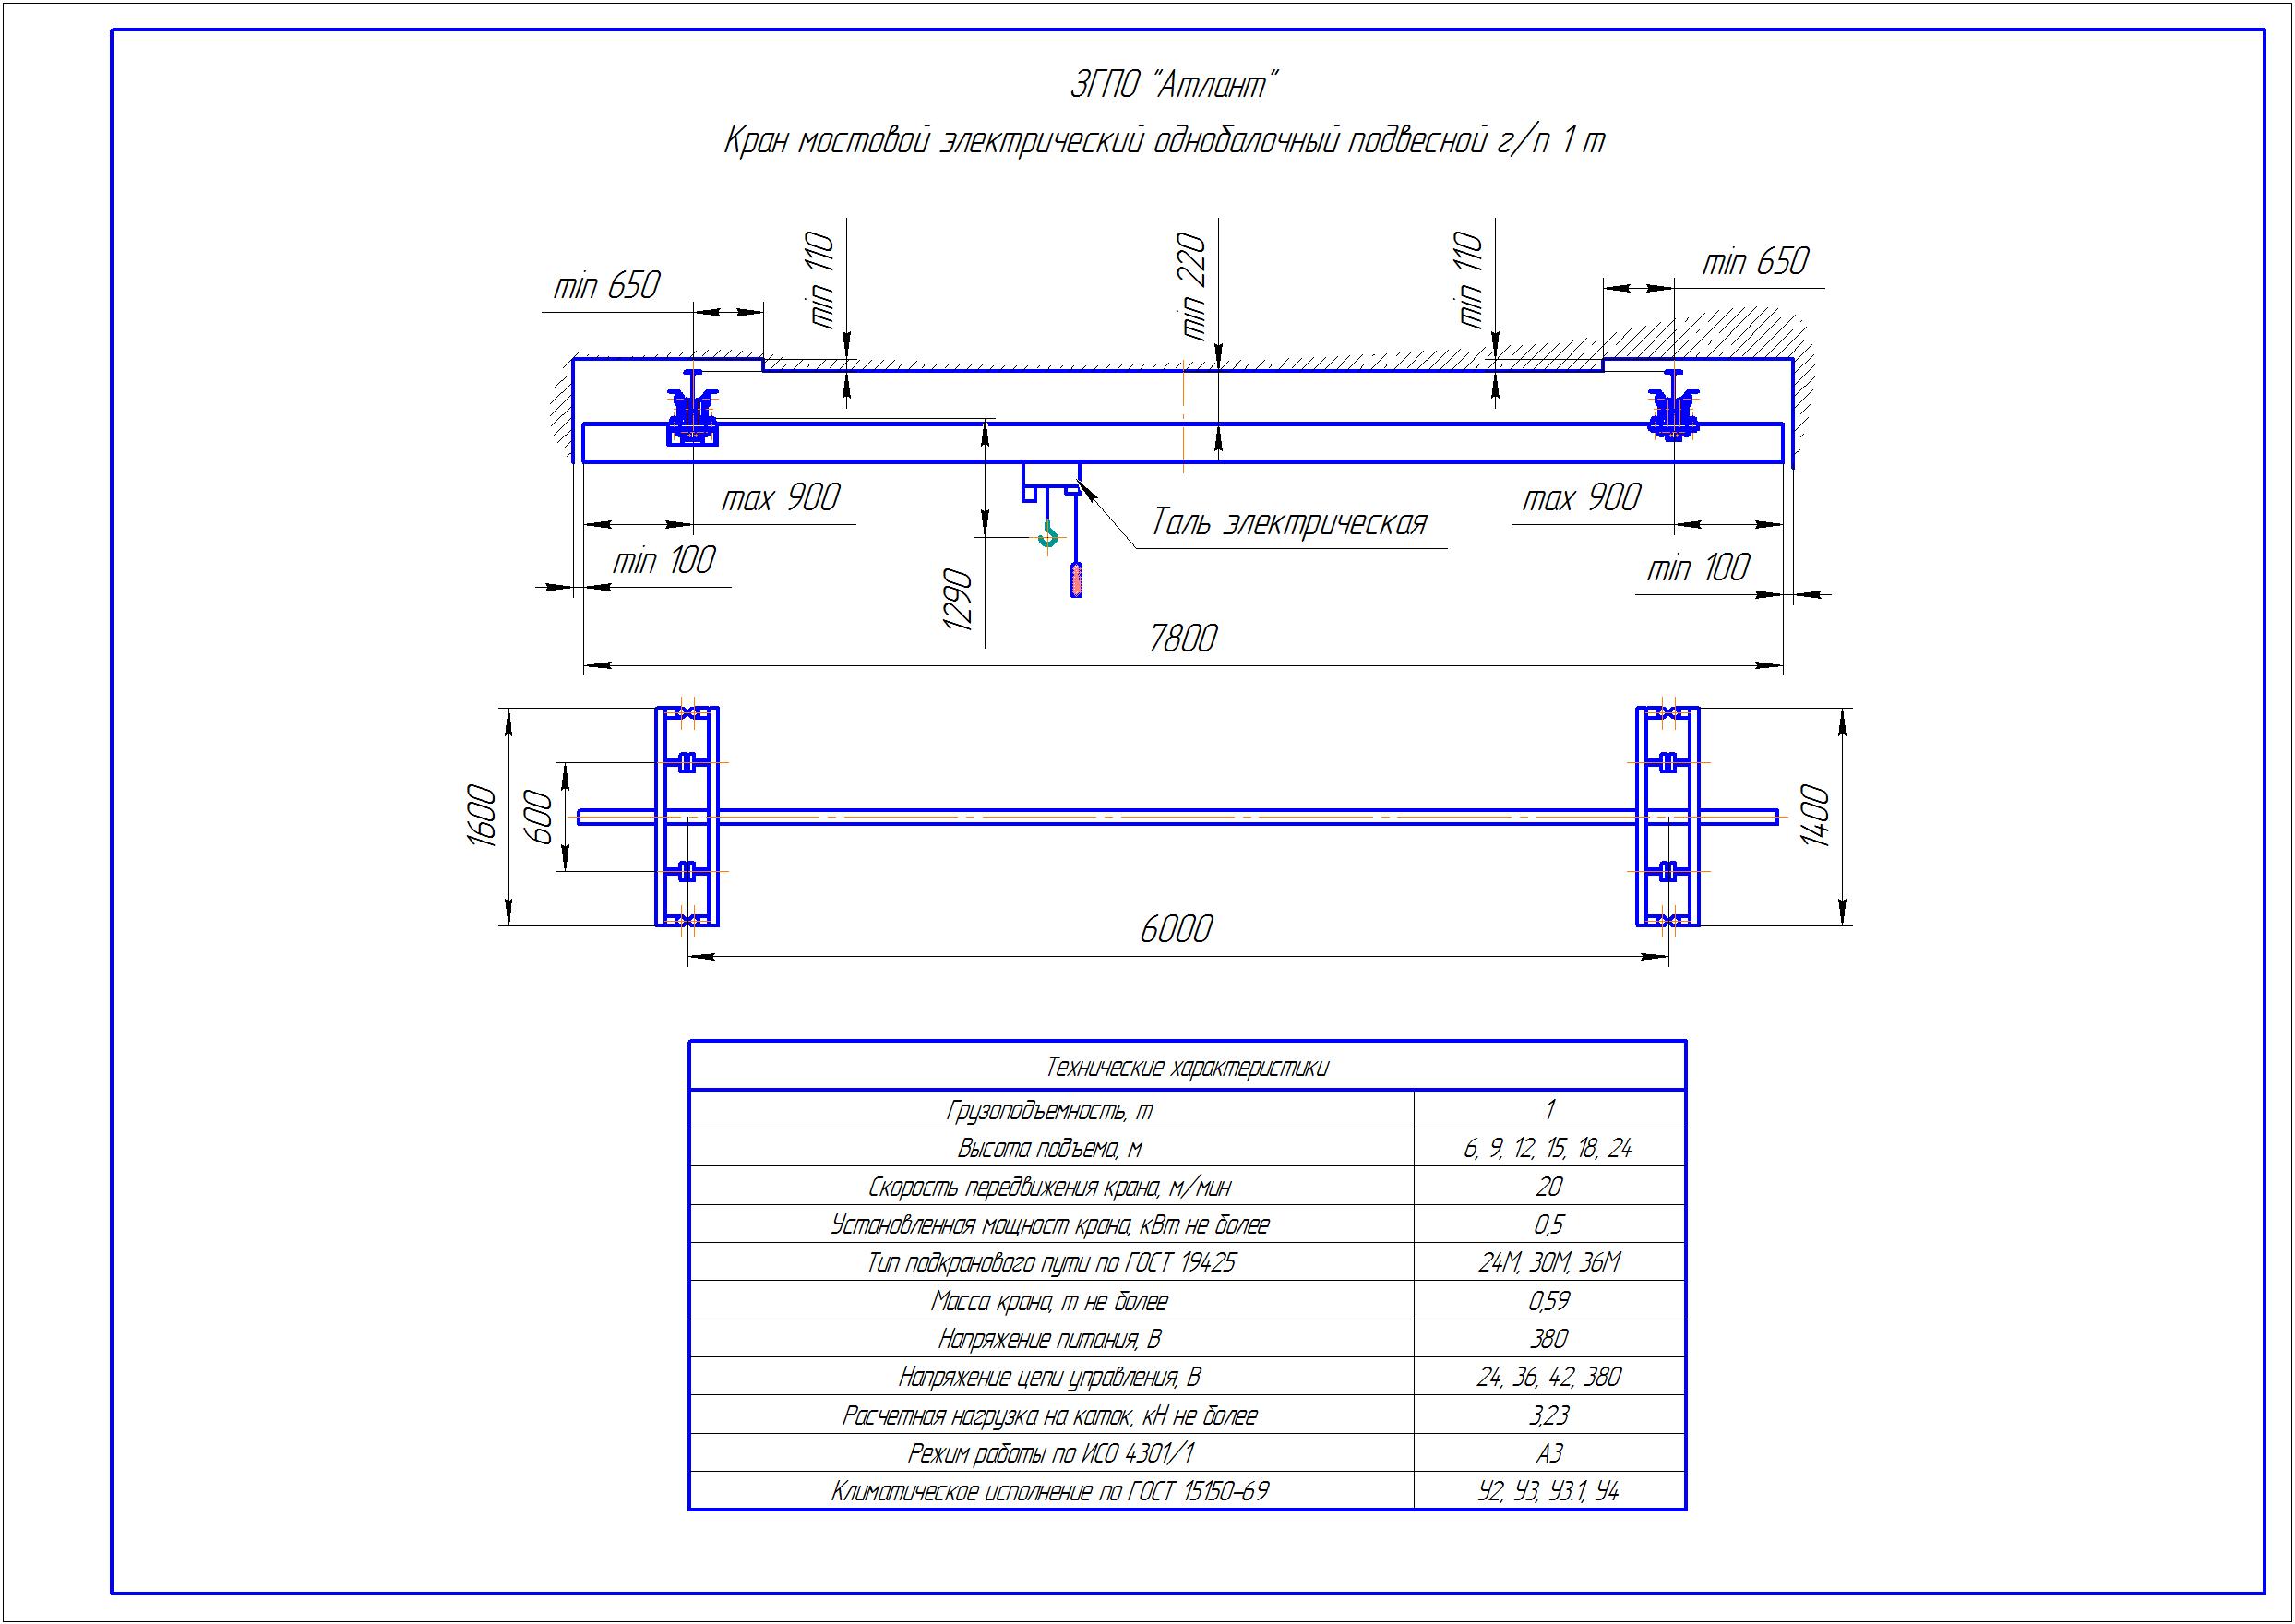 KBP 1 2 - Подвесная кран балка